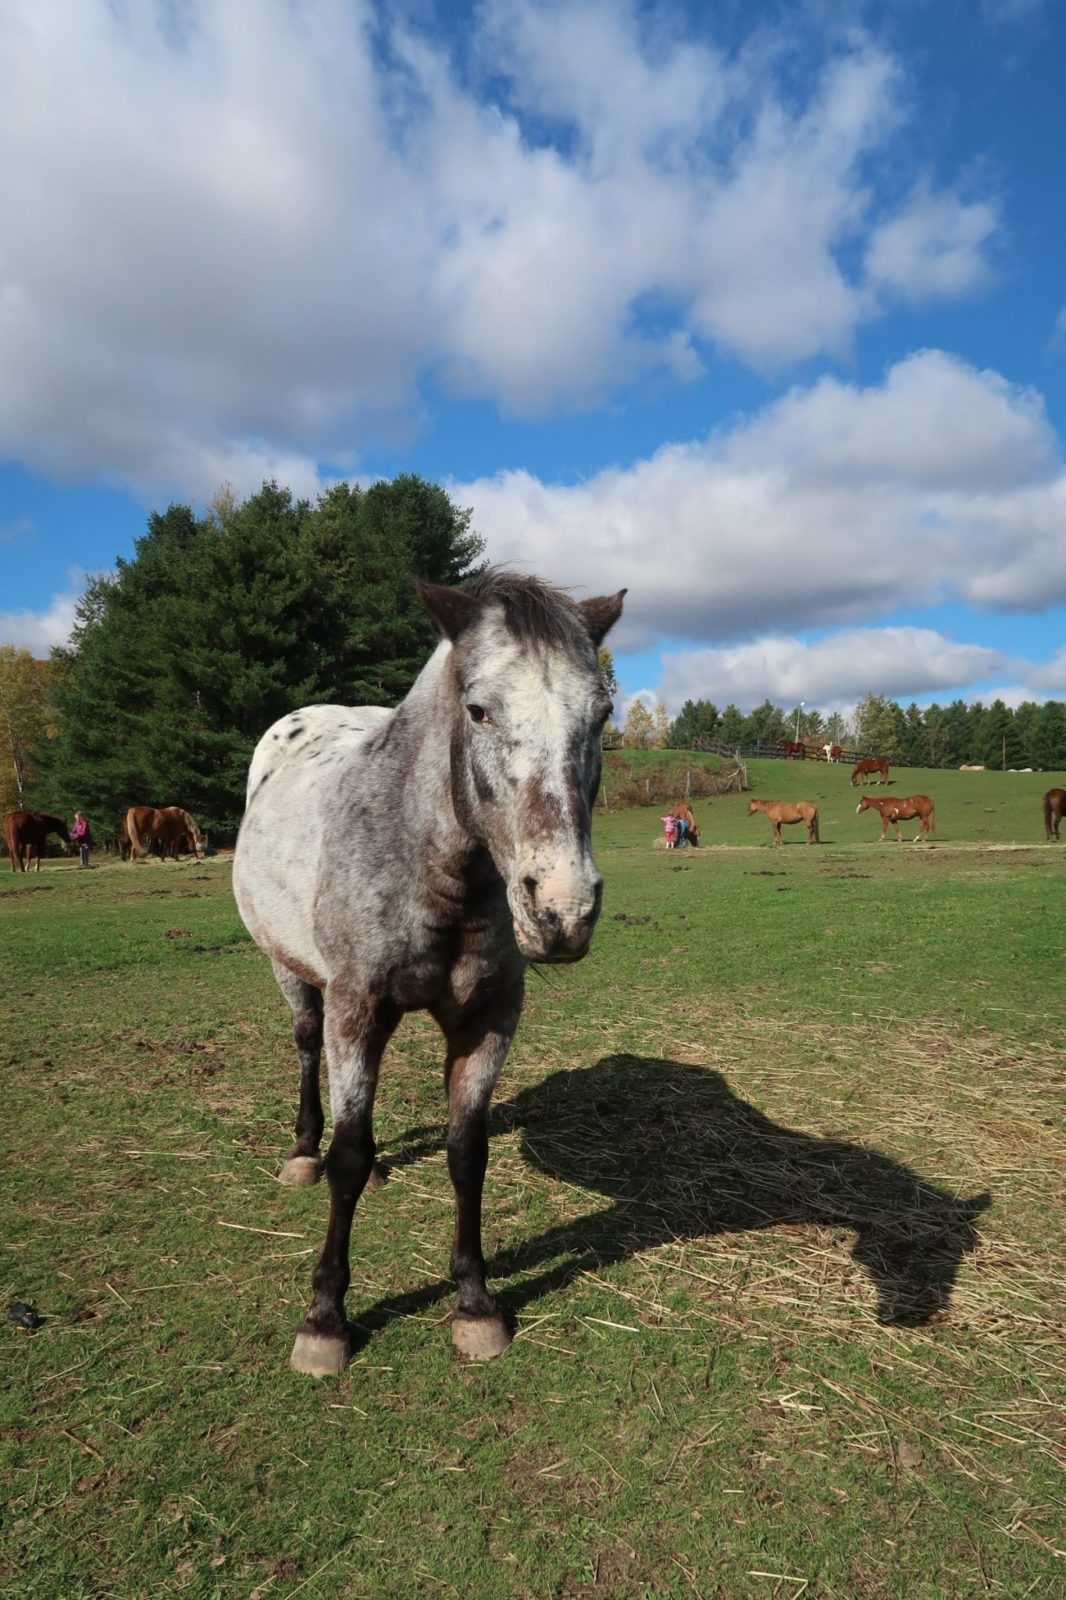 horseback riding in Quebec